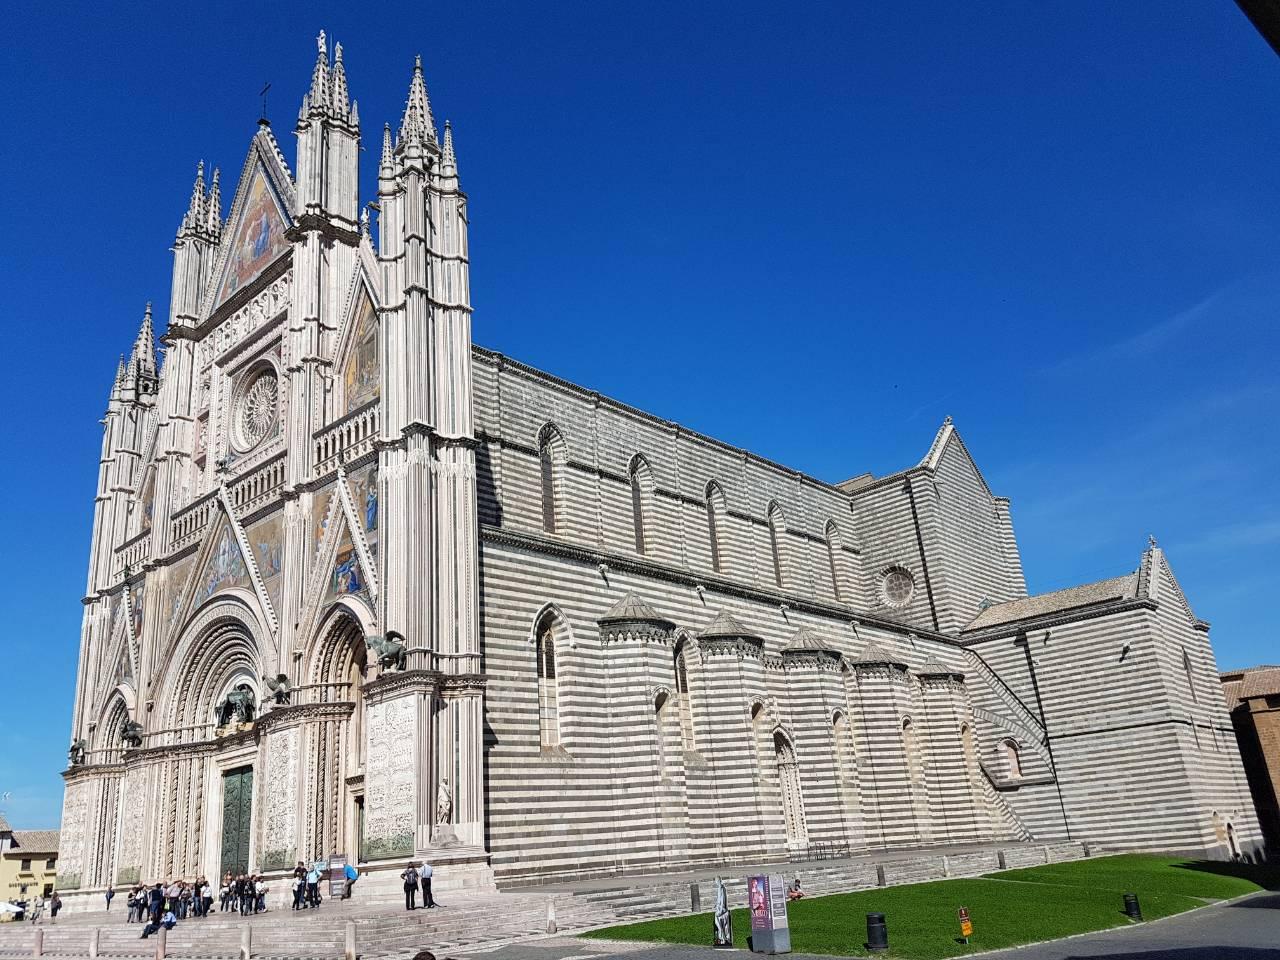 Orvieto private tour - Duomo